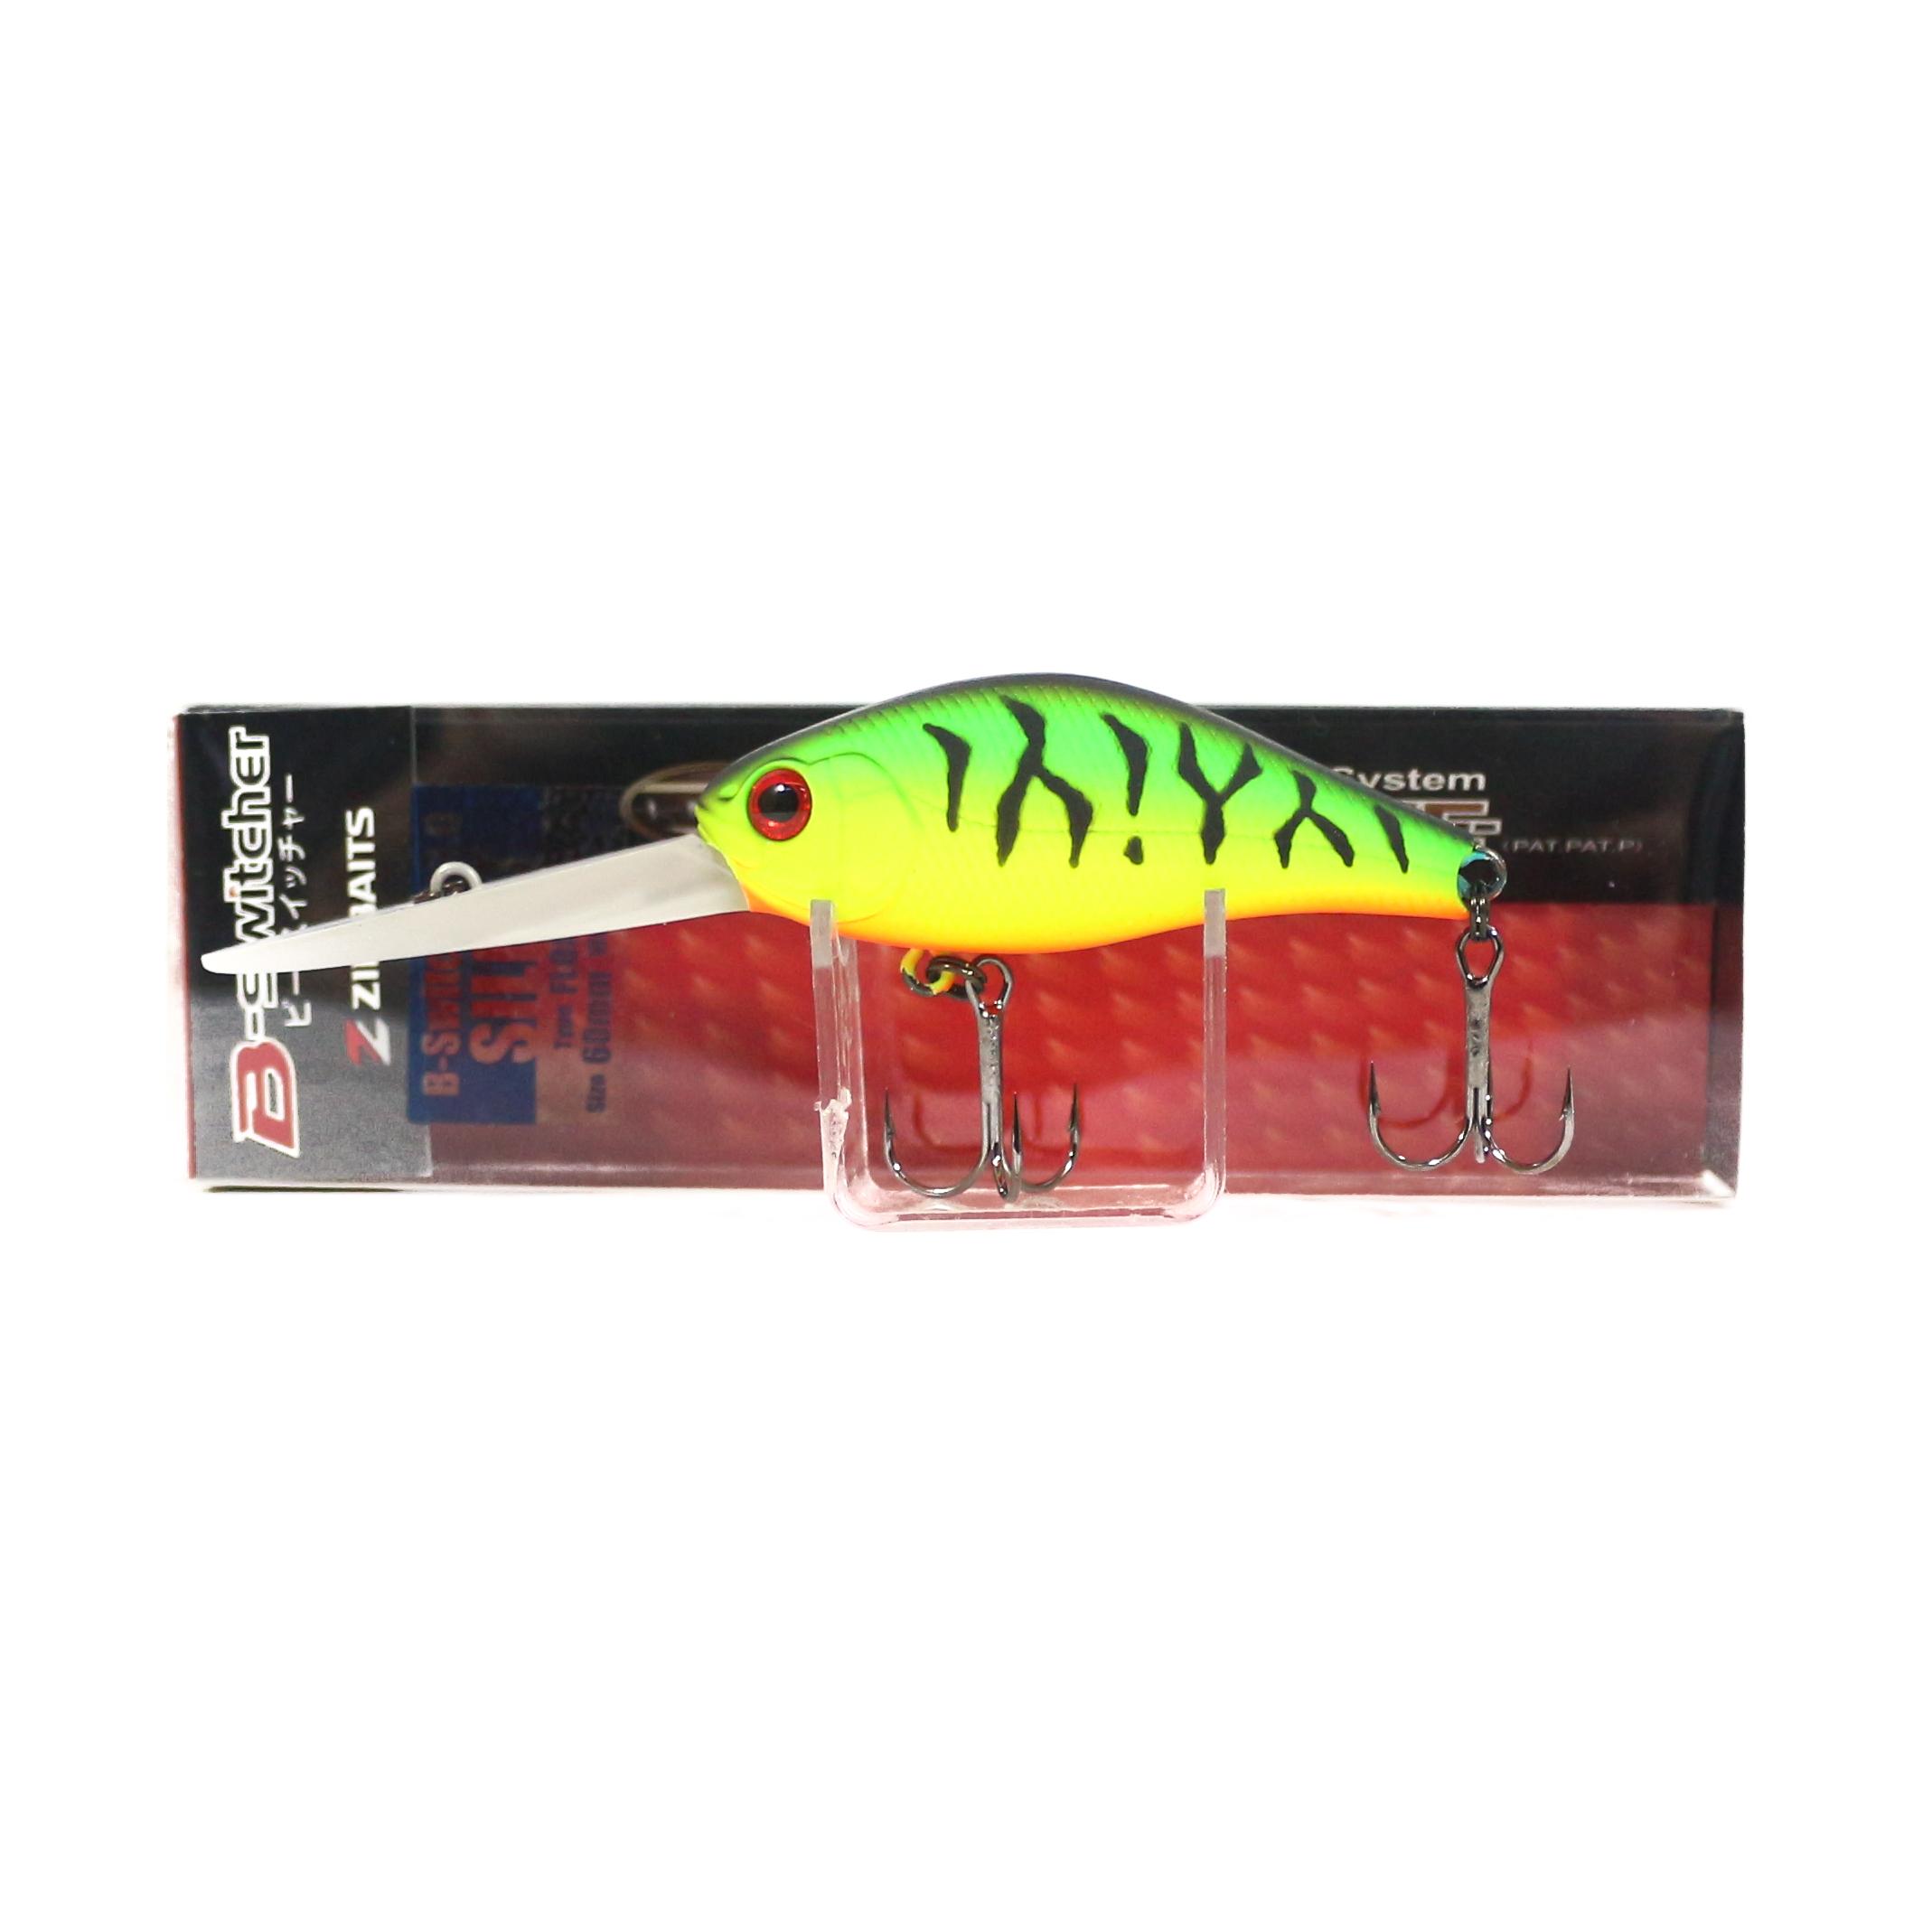 Zipbaits B Switcher 3.0 65mm Floating Lure 995 (7191)